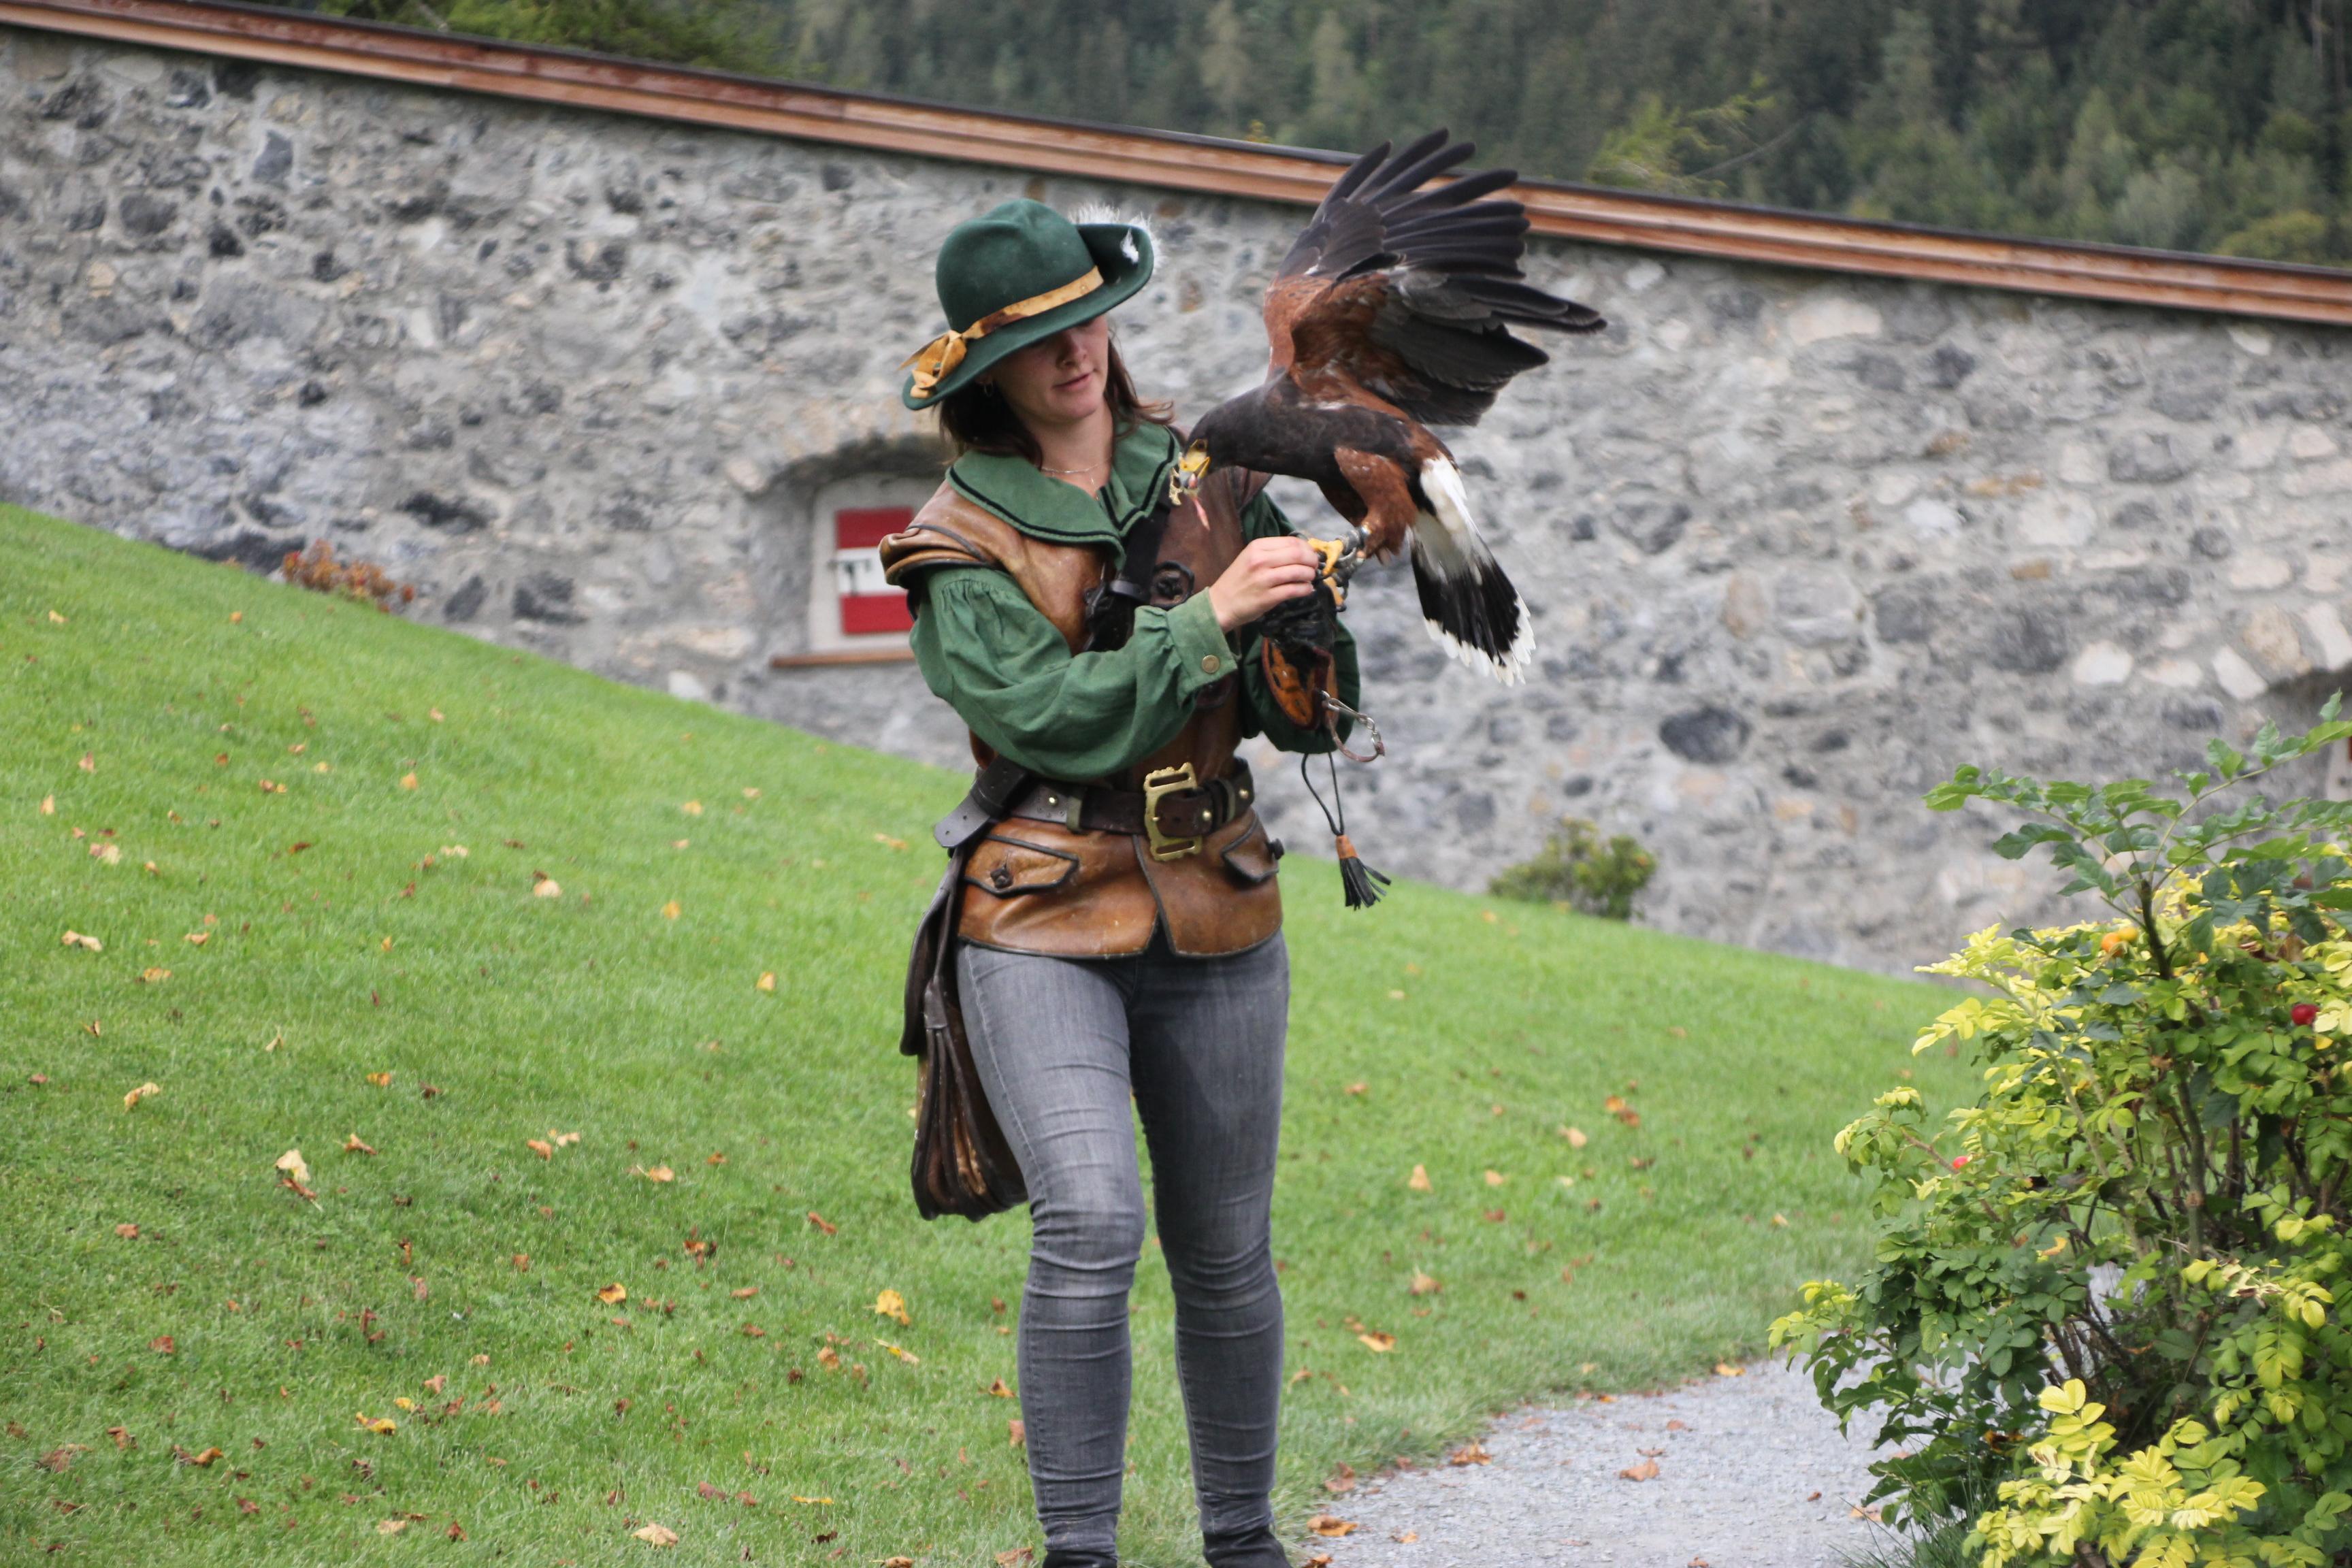 falconry at Hohenwerfen copyright Wibke Carter